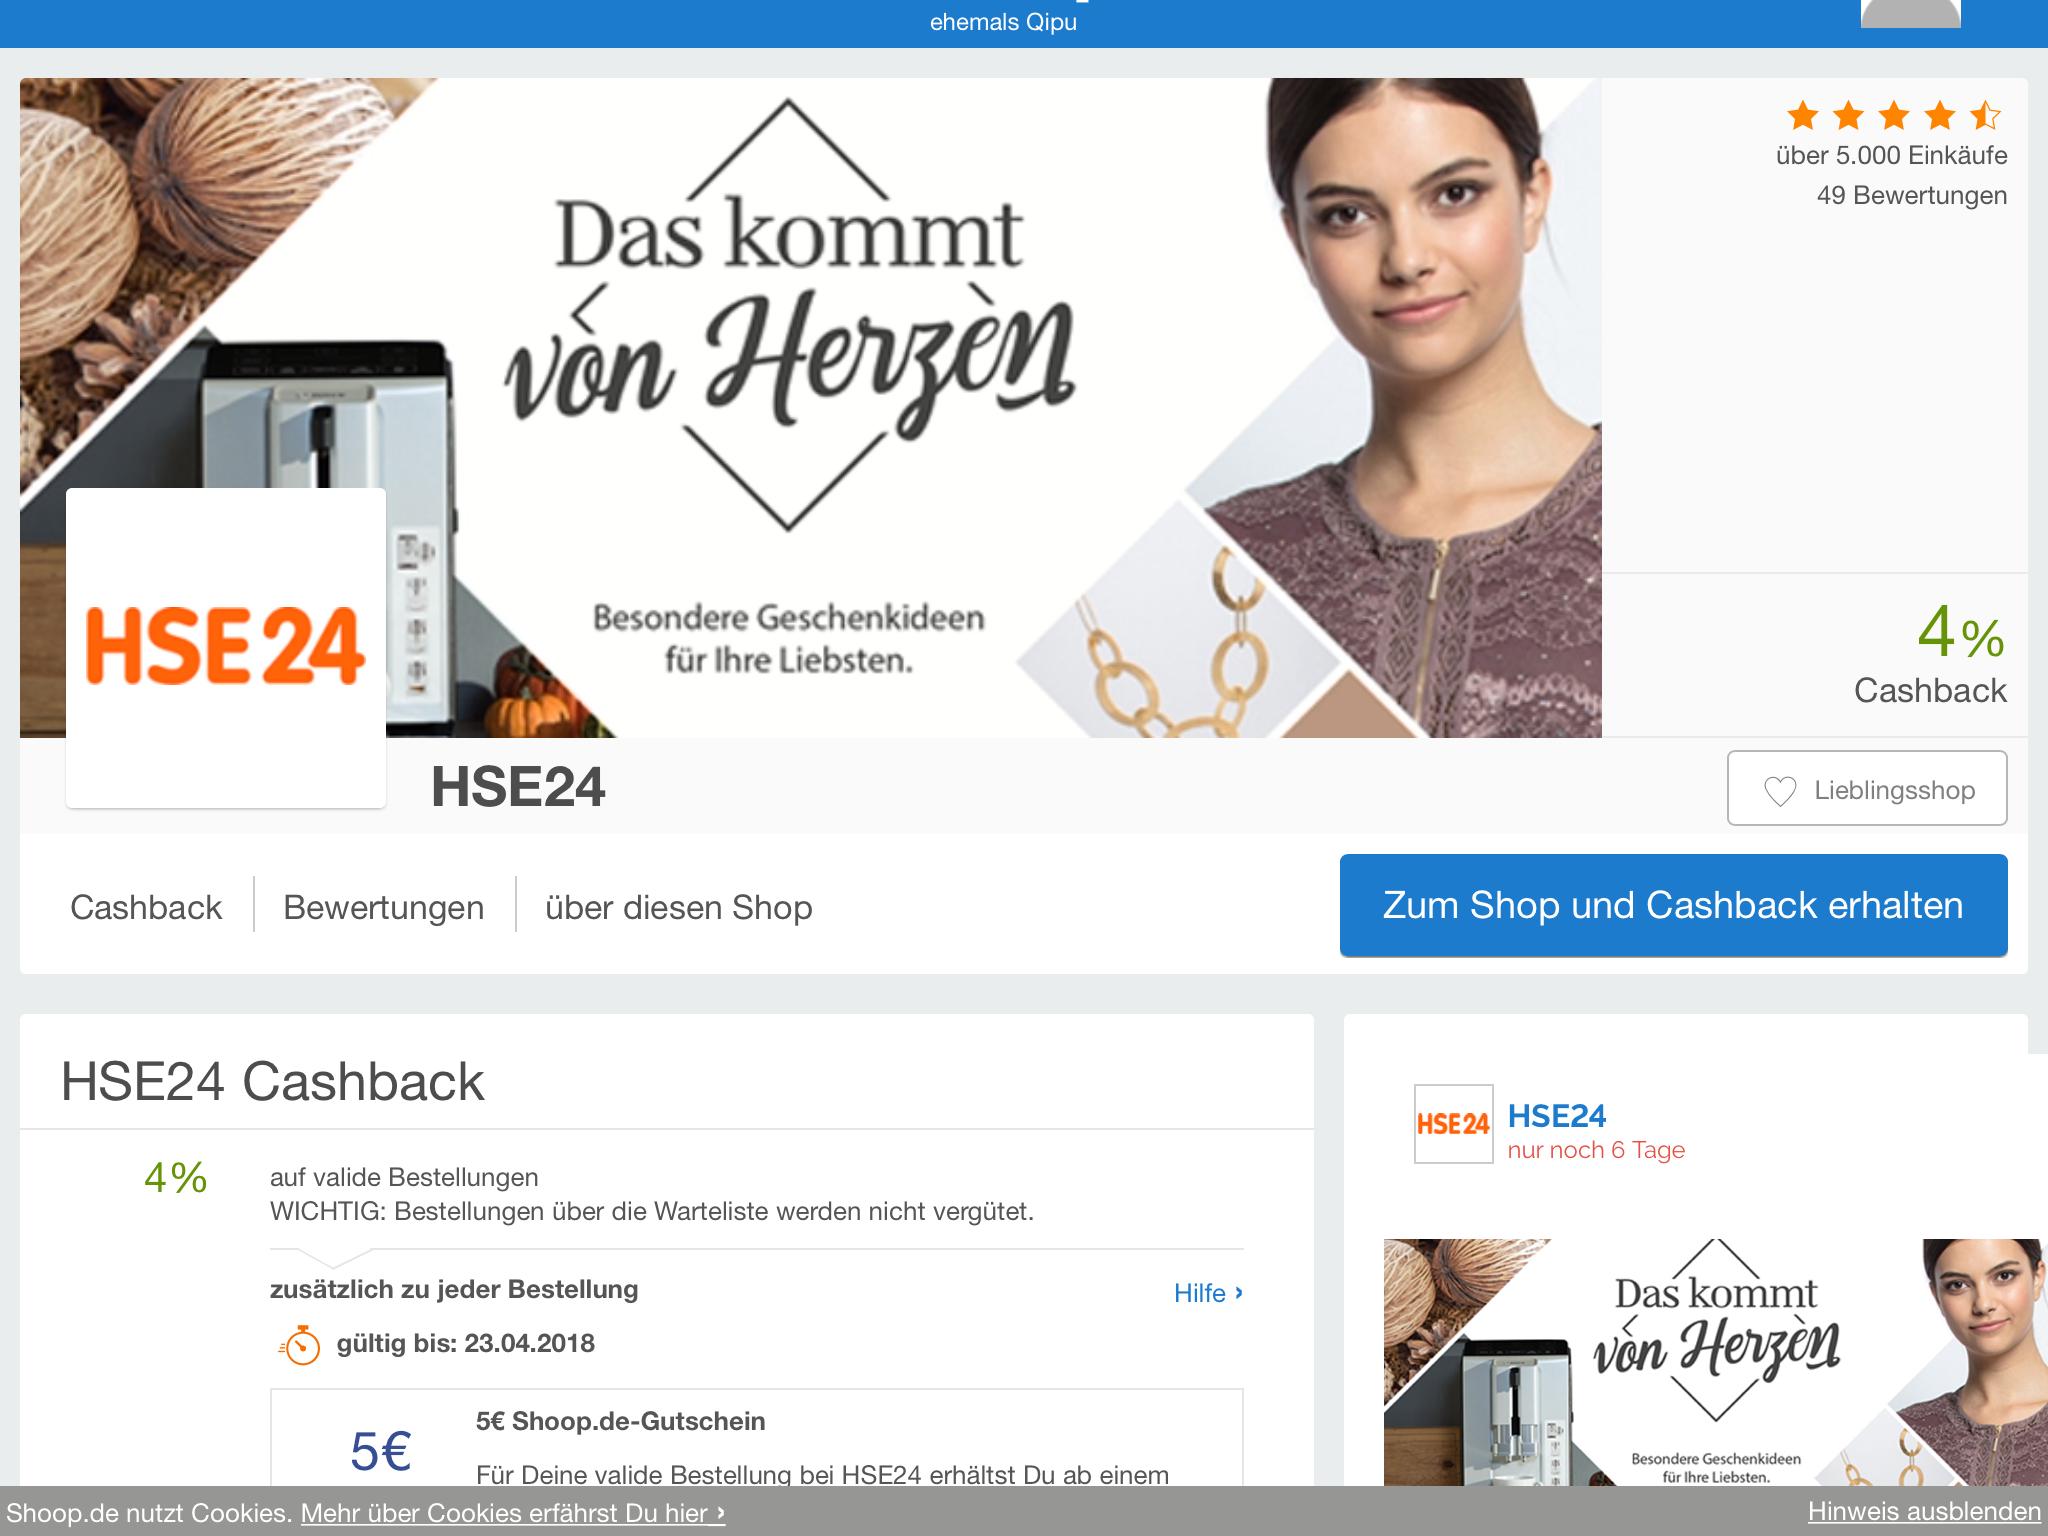 (Shoop) bei HSE24 4% Cashback + 5€ Shoop.de-Gutschein ab 30€ MBW